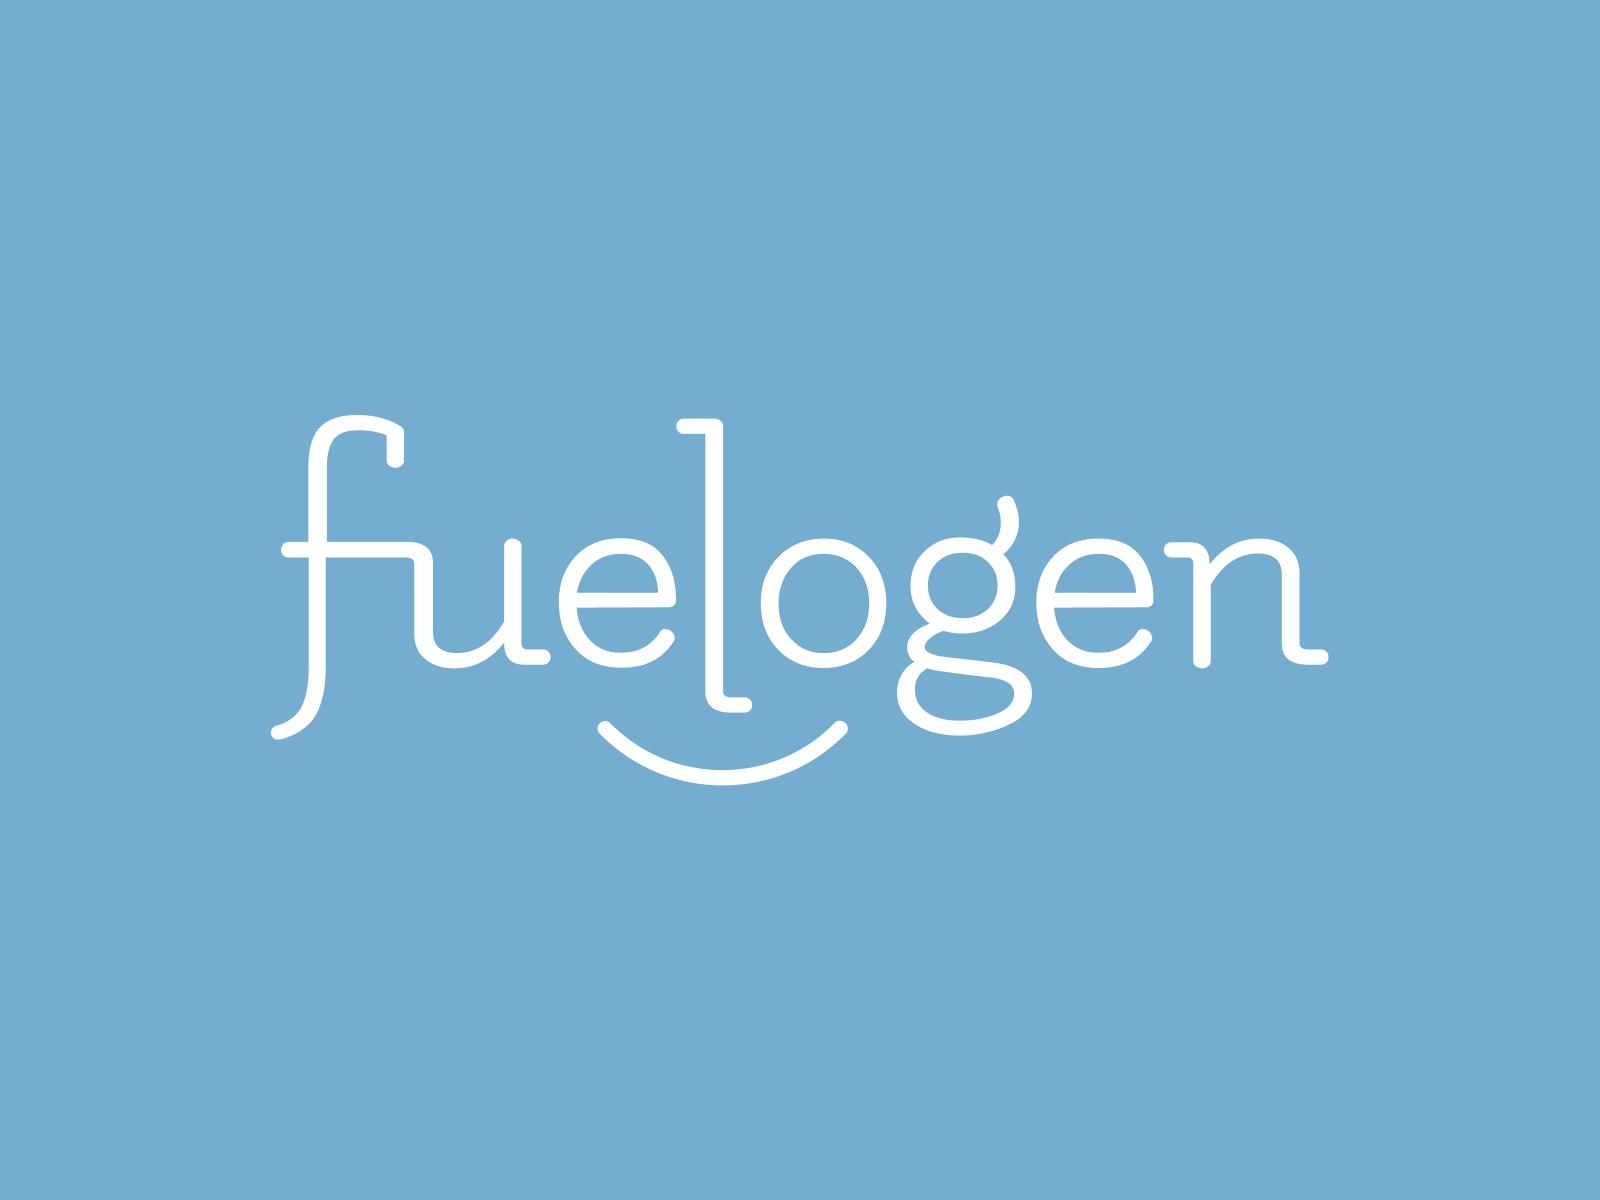 Fuelogen_logo_dribbble1